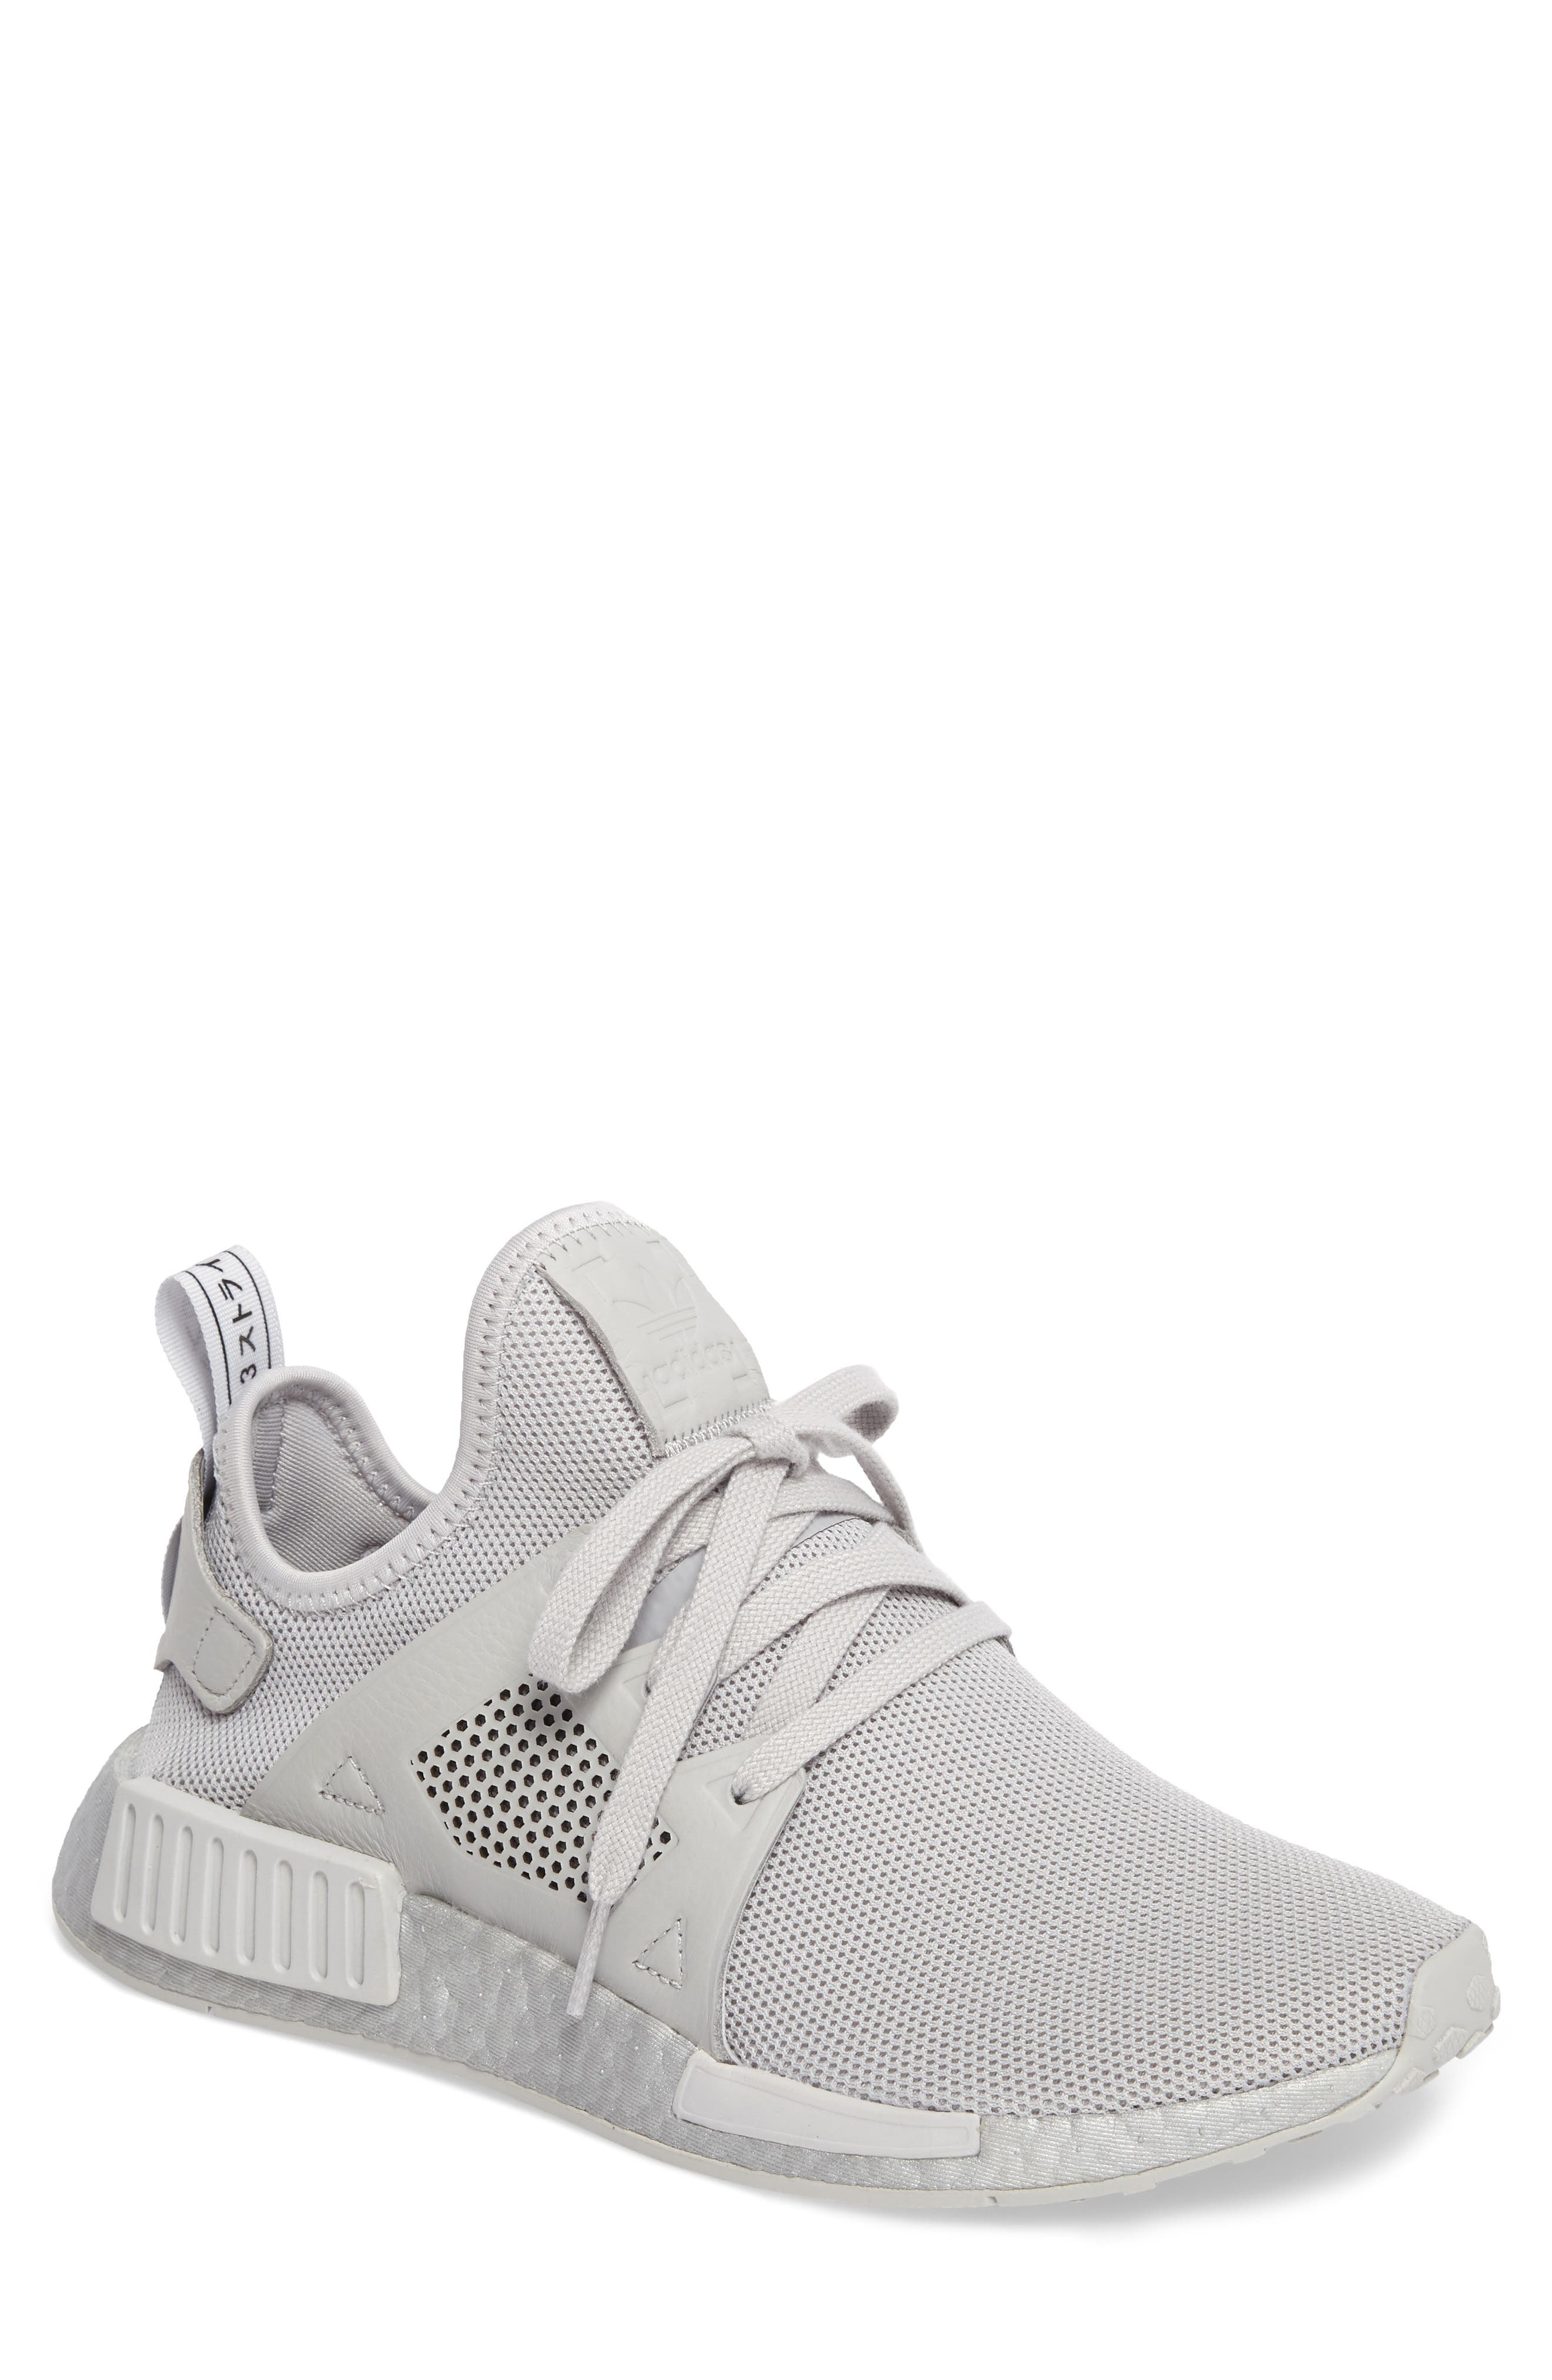 adidas NMD XR1 Sneaker (Men)